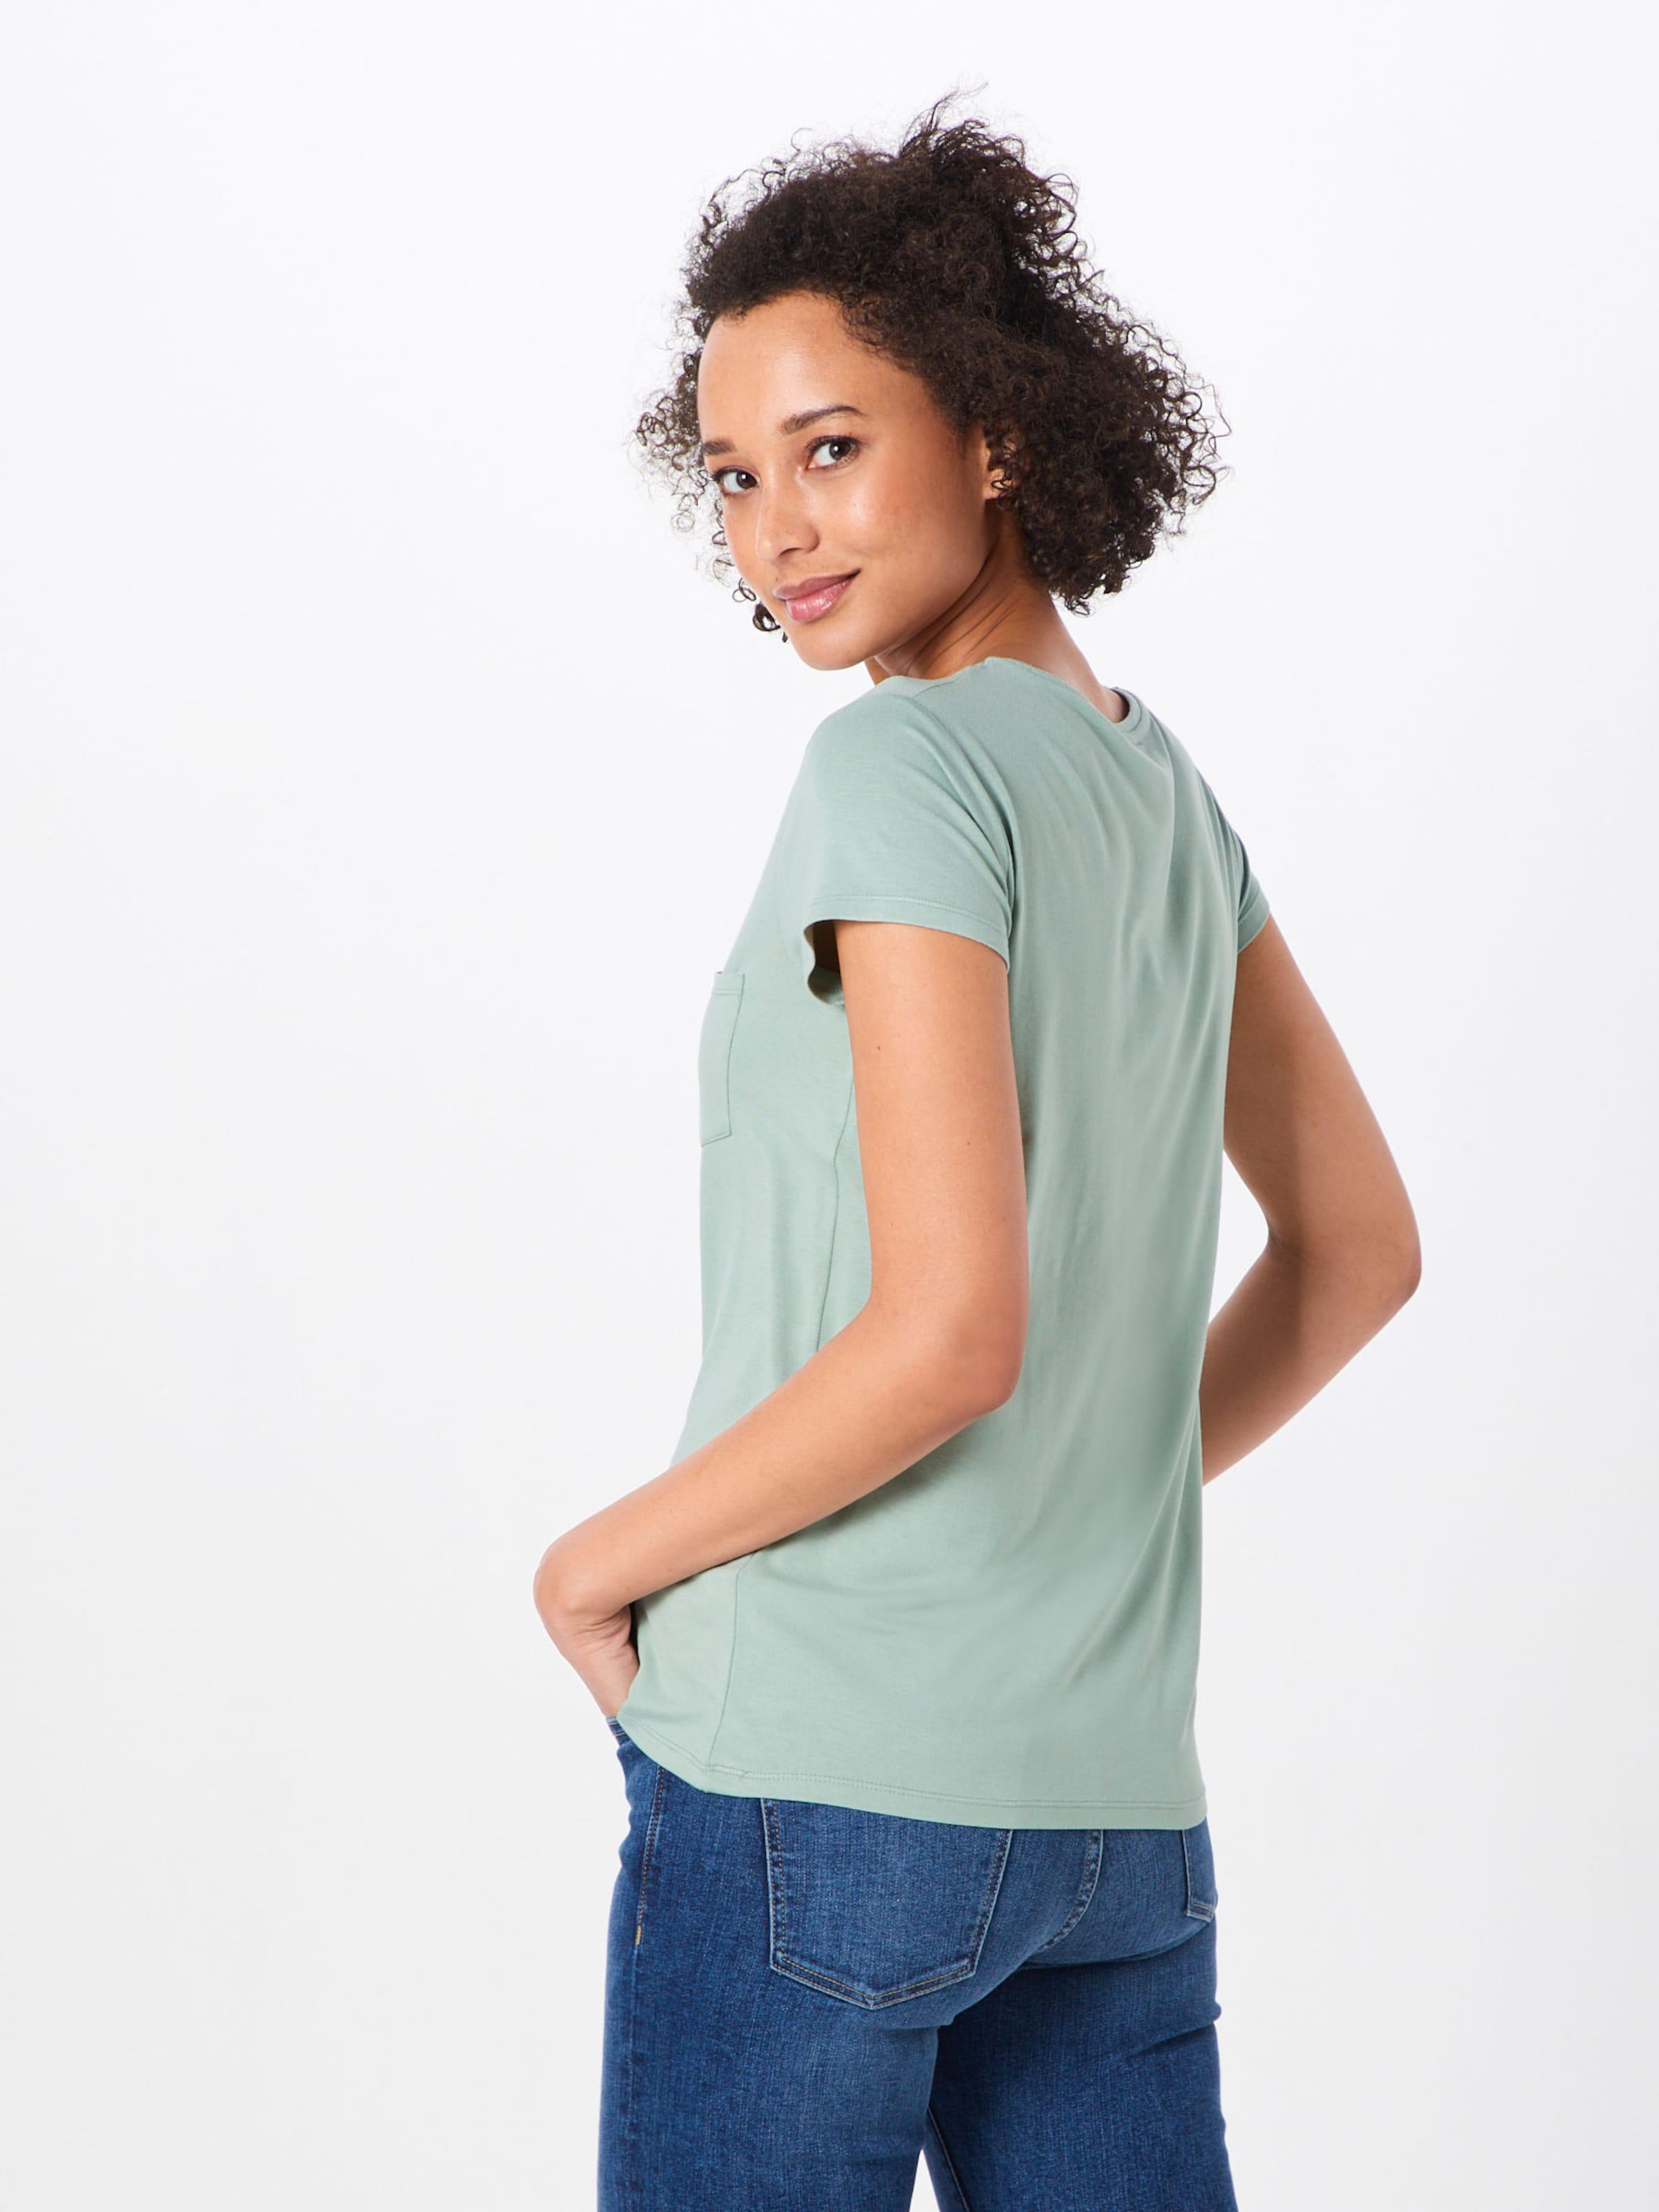 You Shirt Jade In About 'darina' 0wkOPn8